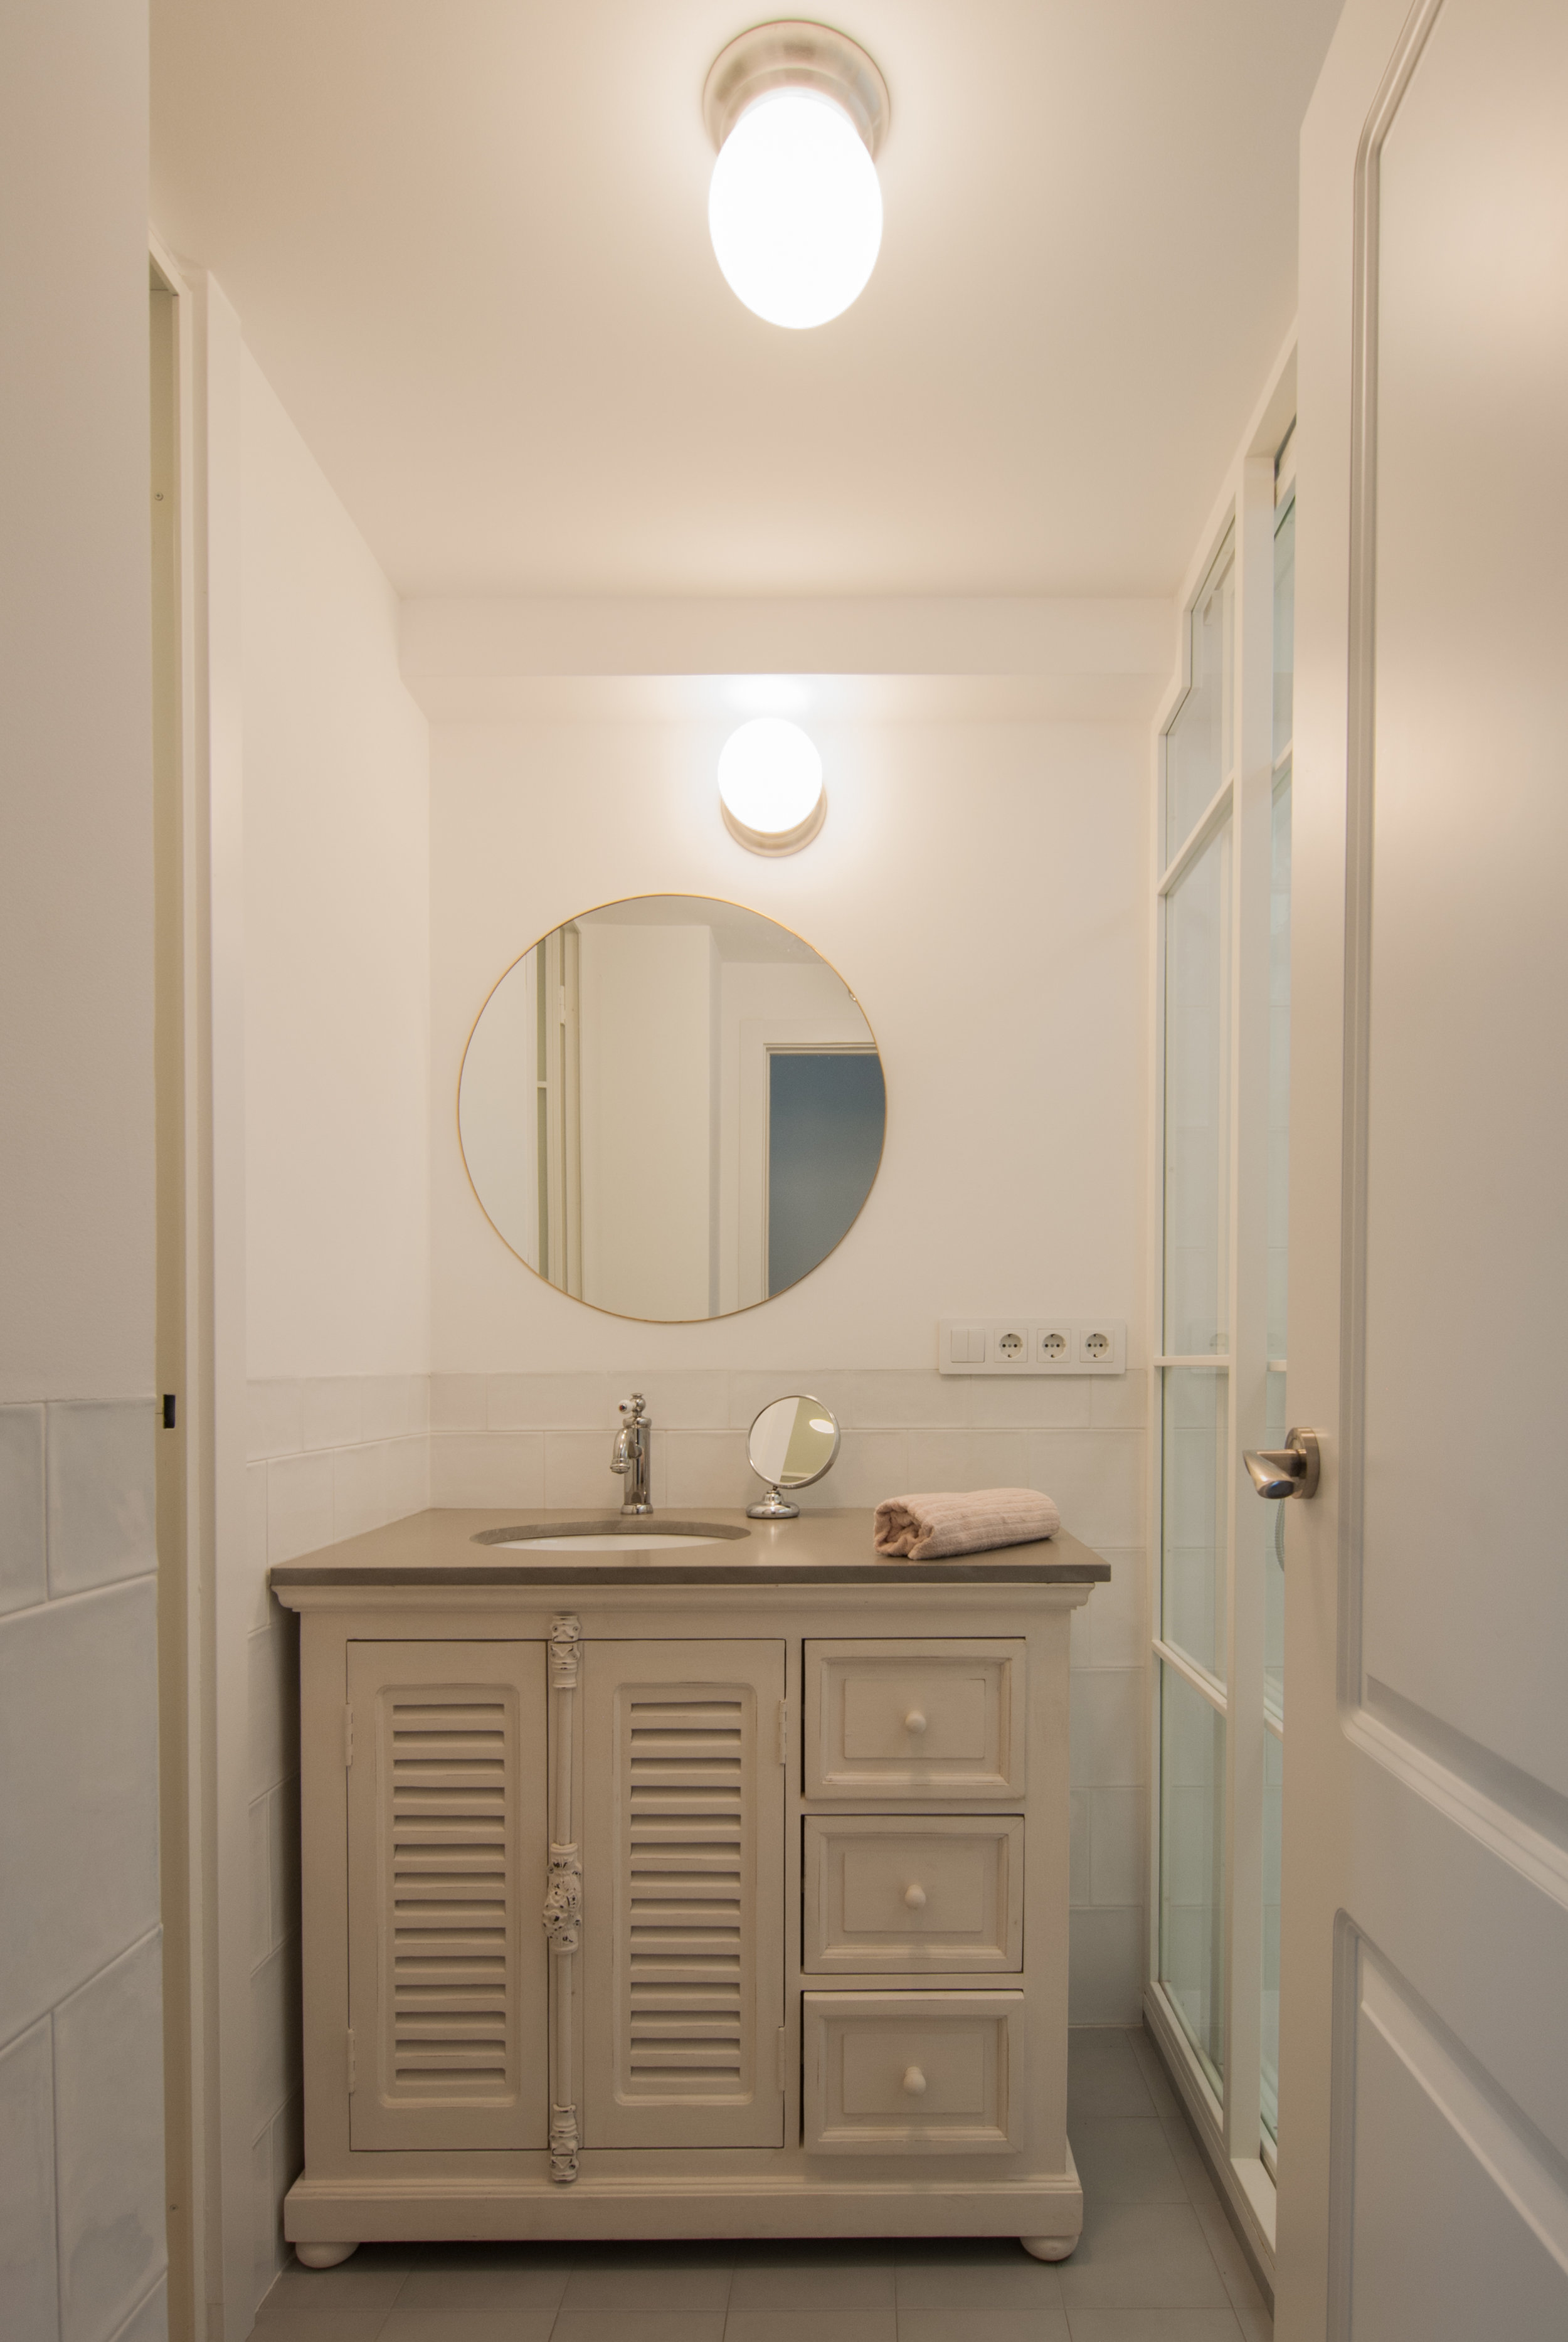 emmme studio slow design interiorismo integral baño chicas hogar Debora.jpg